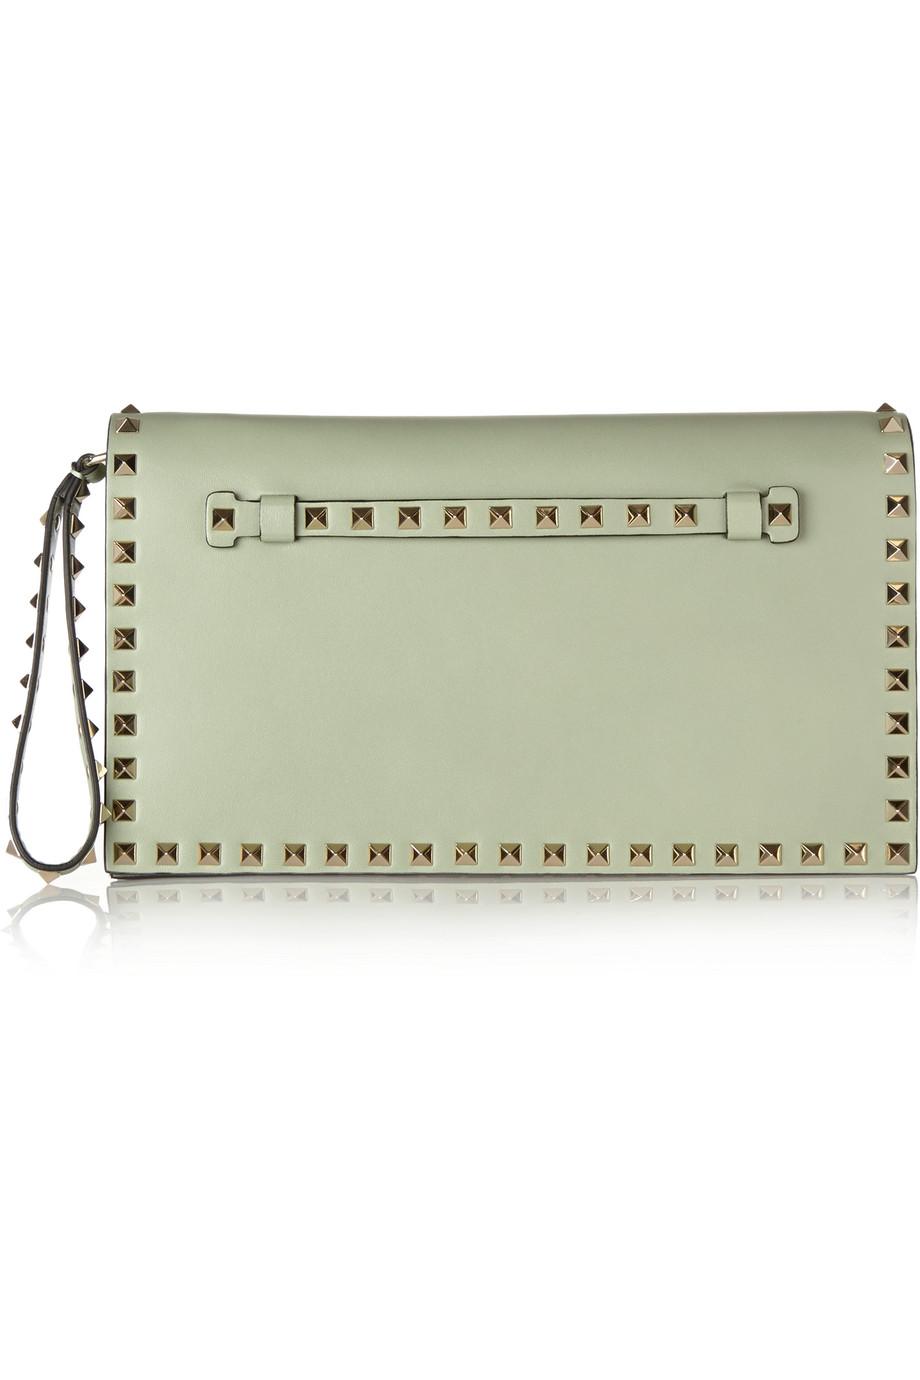 Valentino The Rockstud Leather Clutch, Mint, Women's